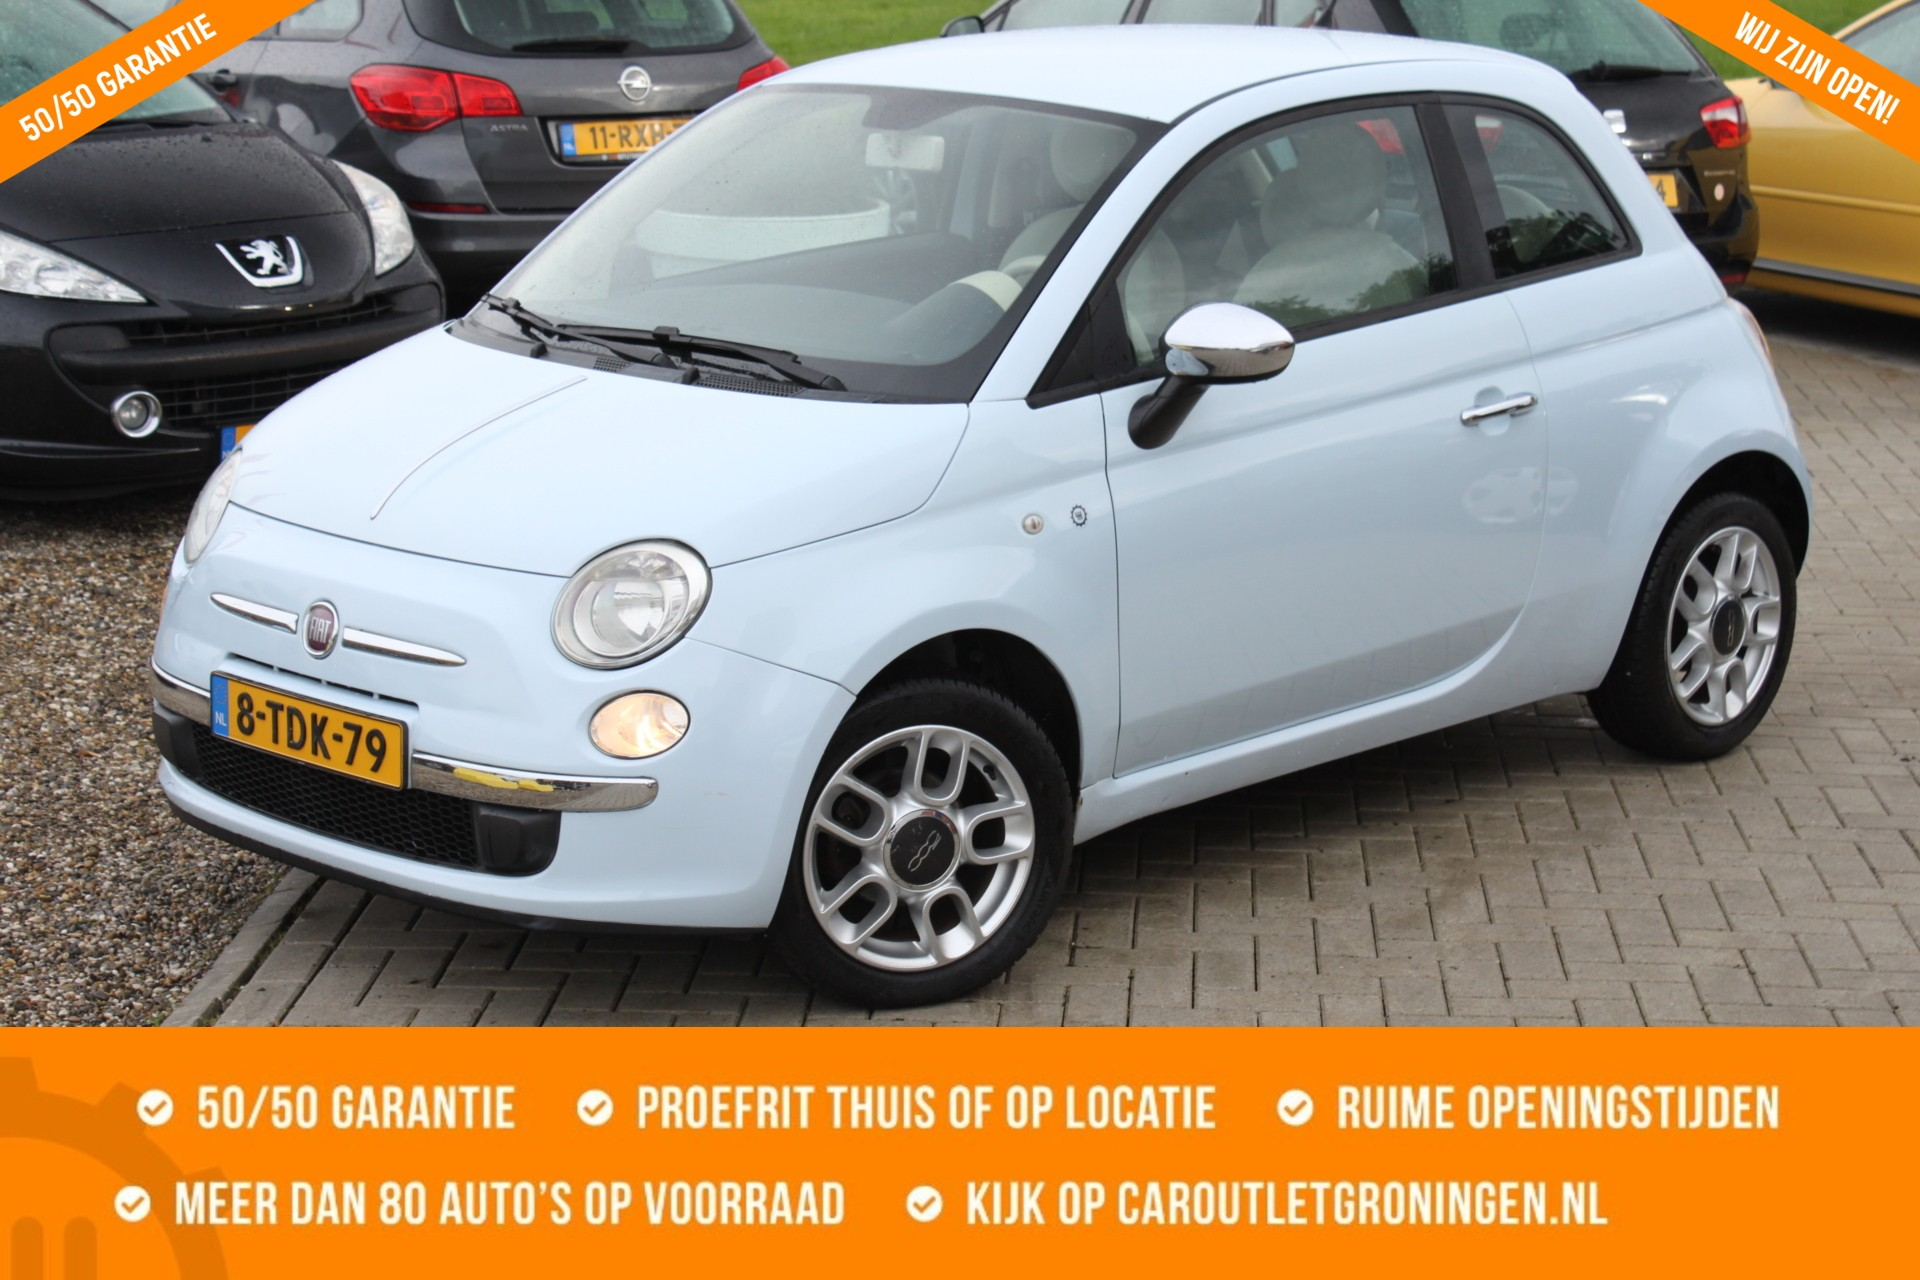 Caroutlet Groningen - Fiat 500 1.2 Pop | AIRCO | NW APK | CHROOM